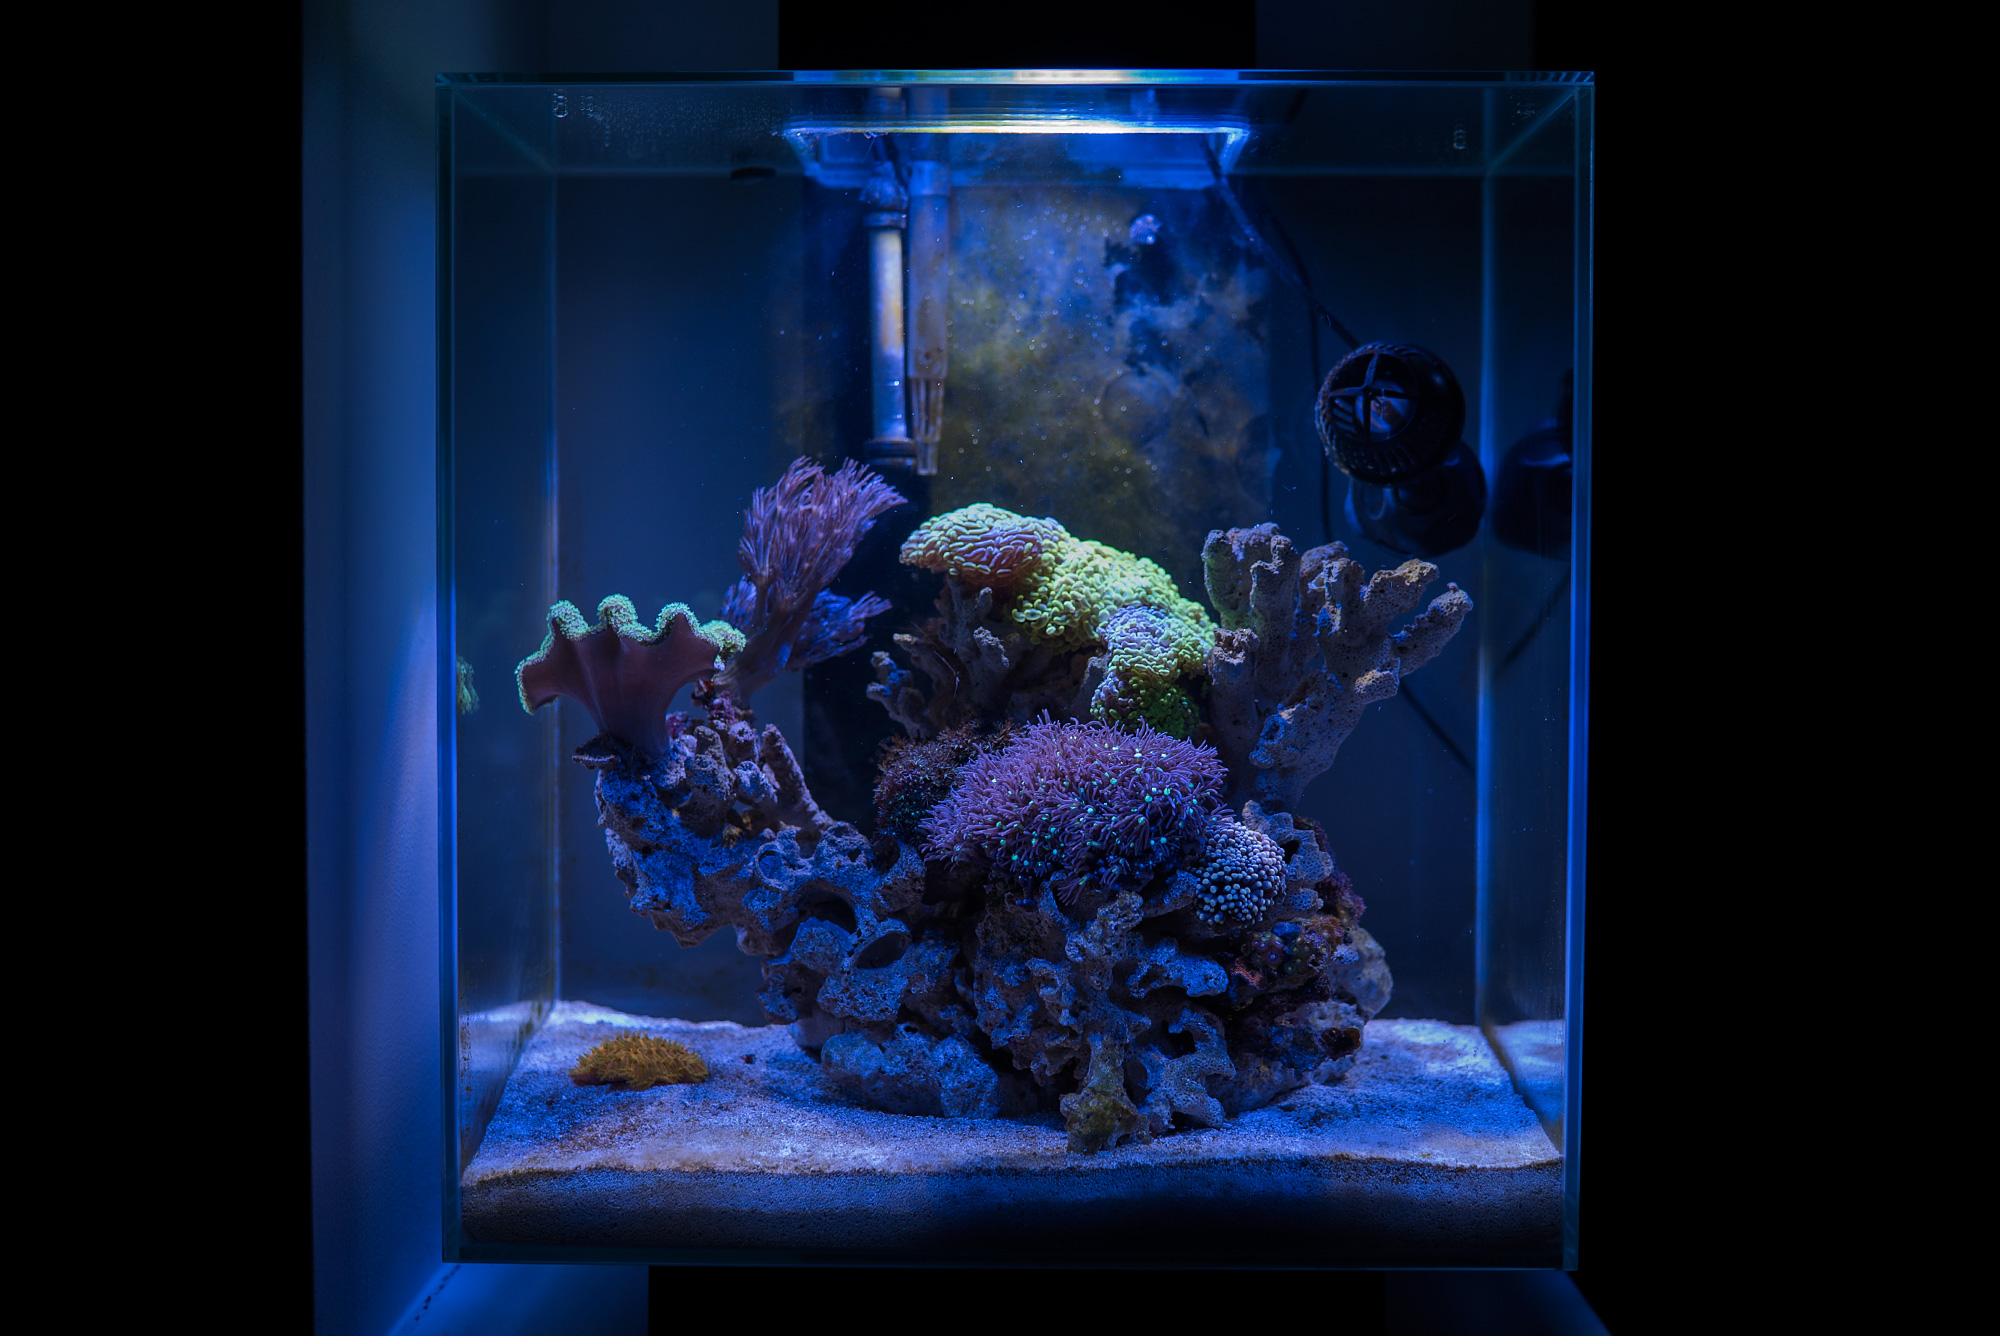 Fish tank queensland - Fluval Edge 2 Reef Nano